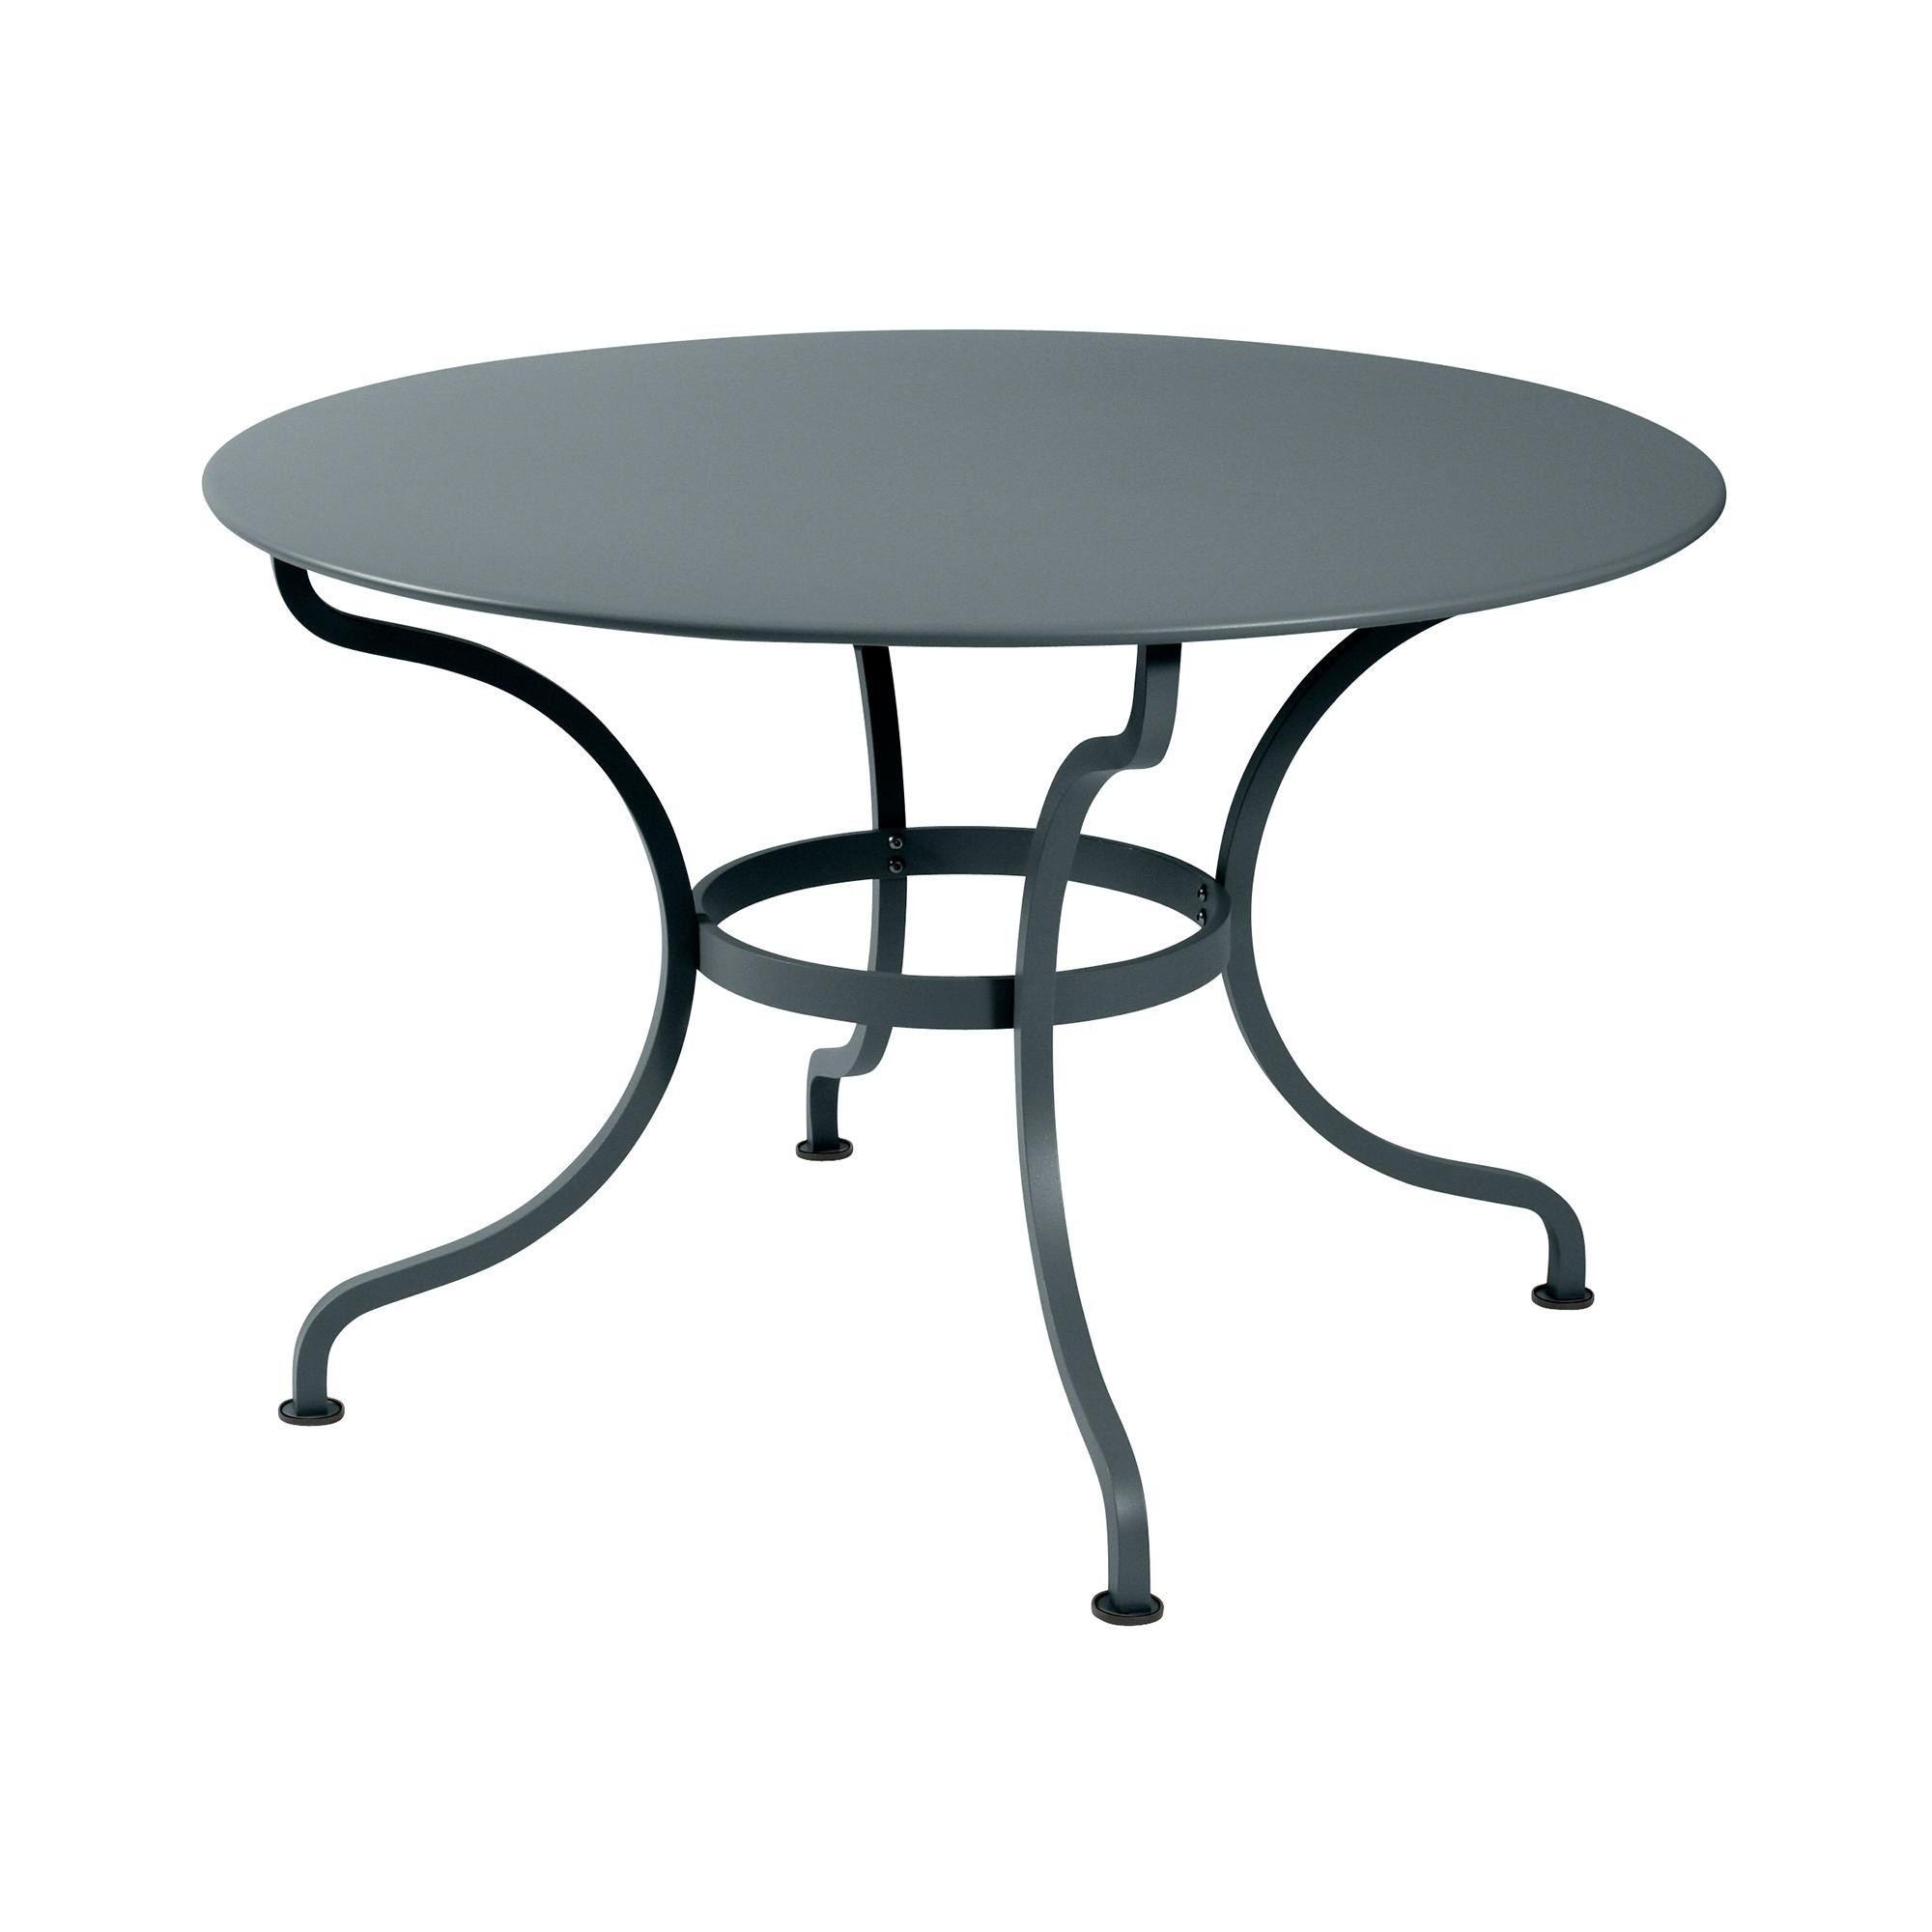 Fermob Romane - Table de jardin Ø 117 cm | AmbienteDirect